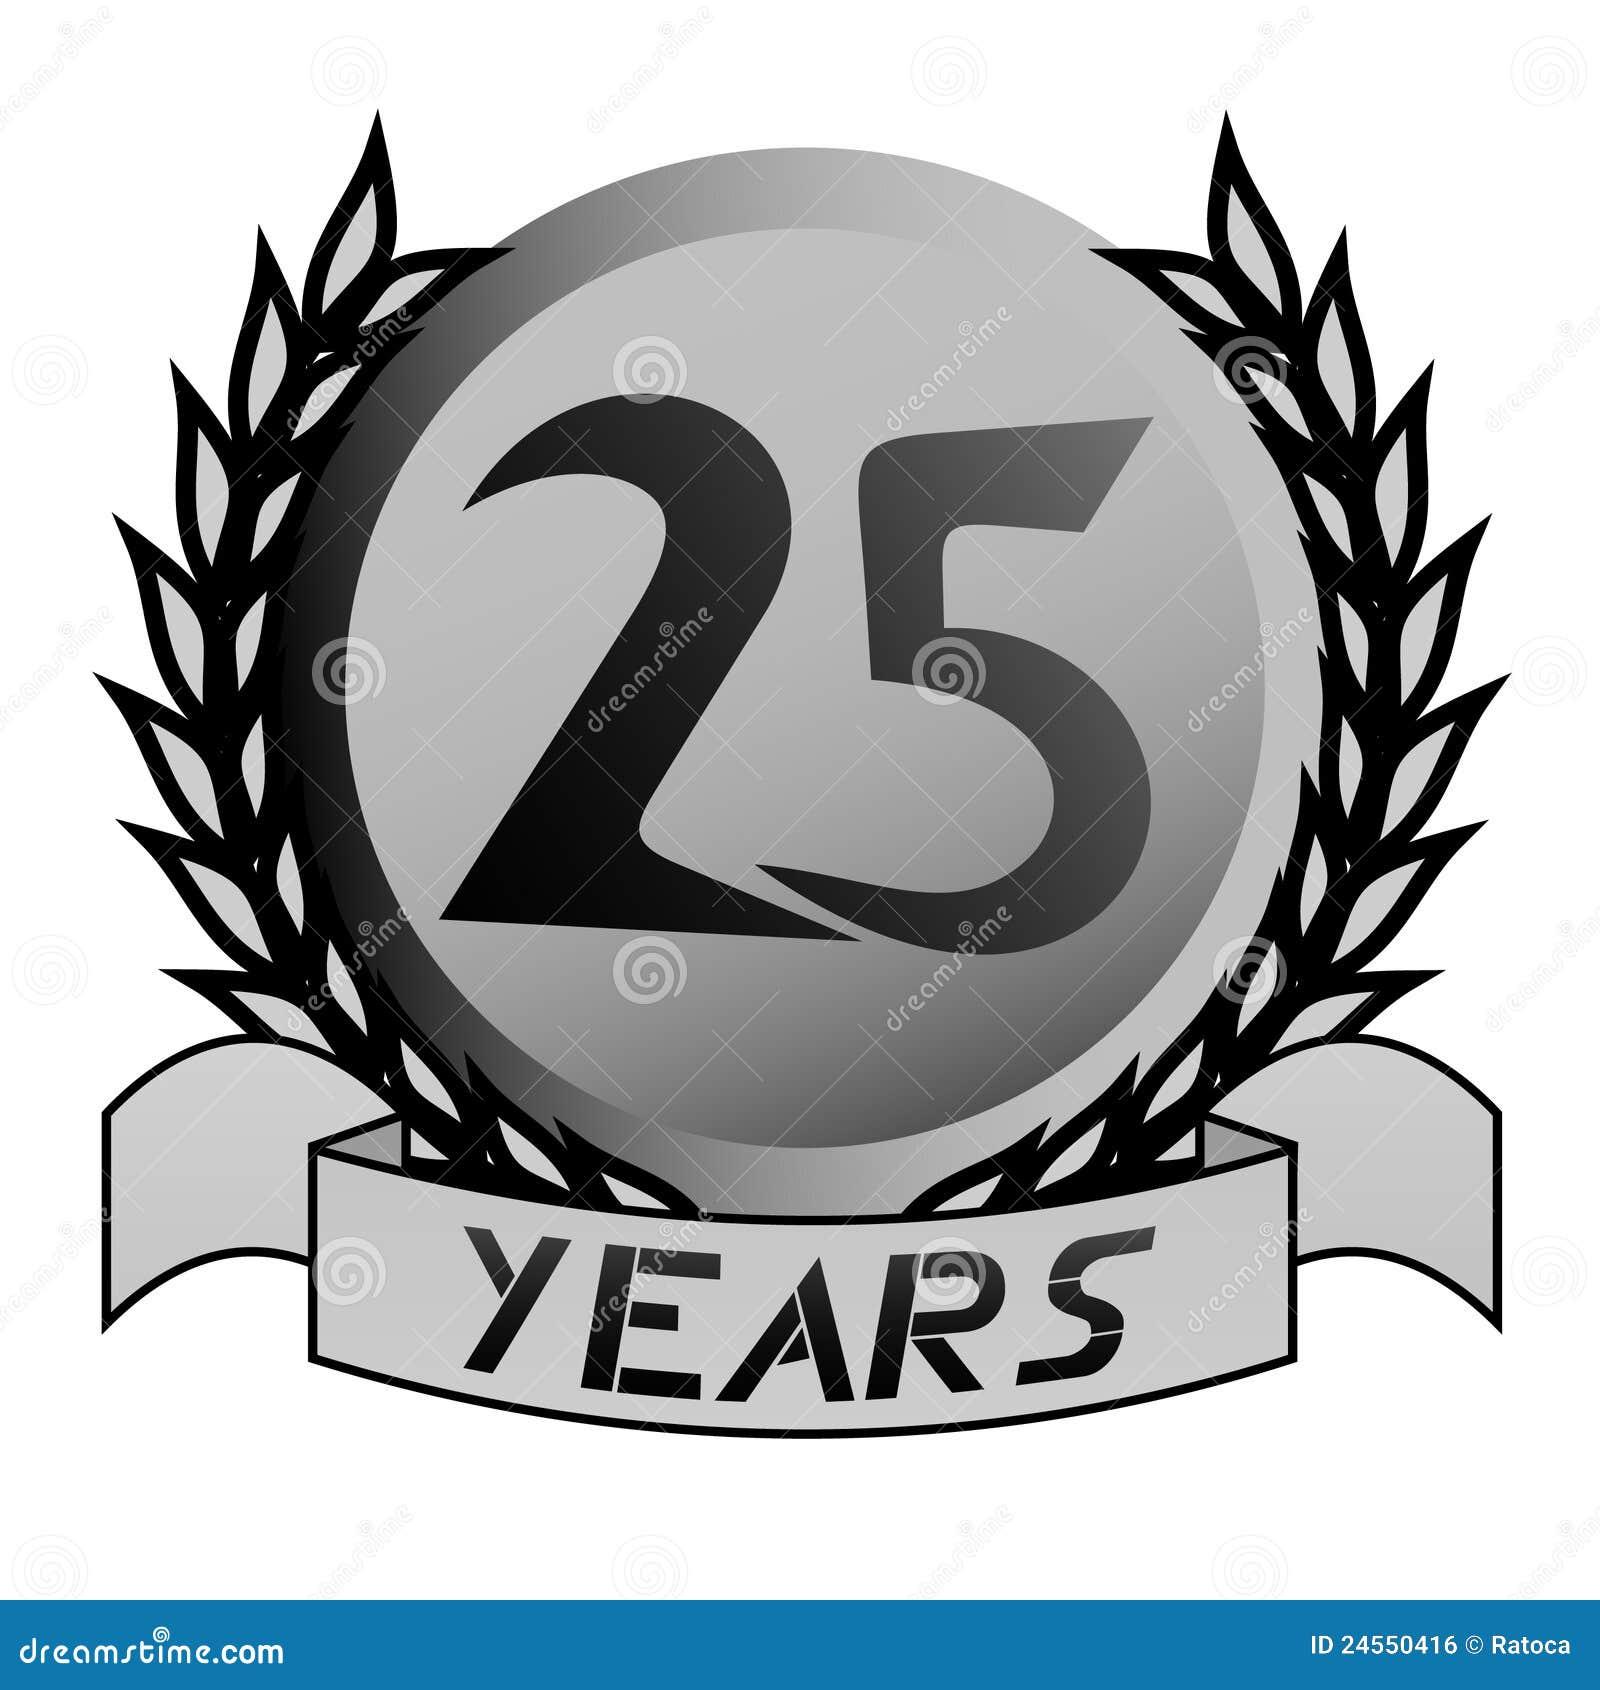 25th Anniversary Emblem Royalty Free Stock Image - Image ...